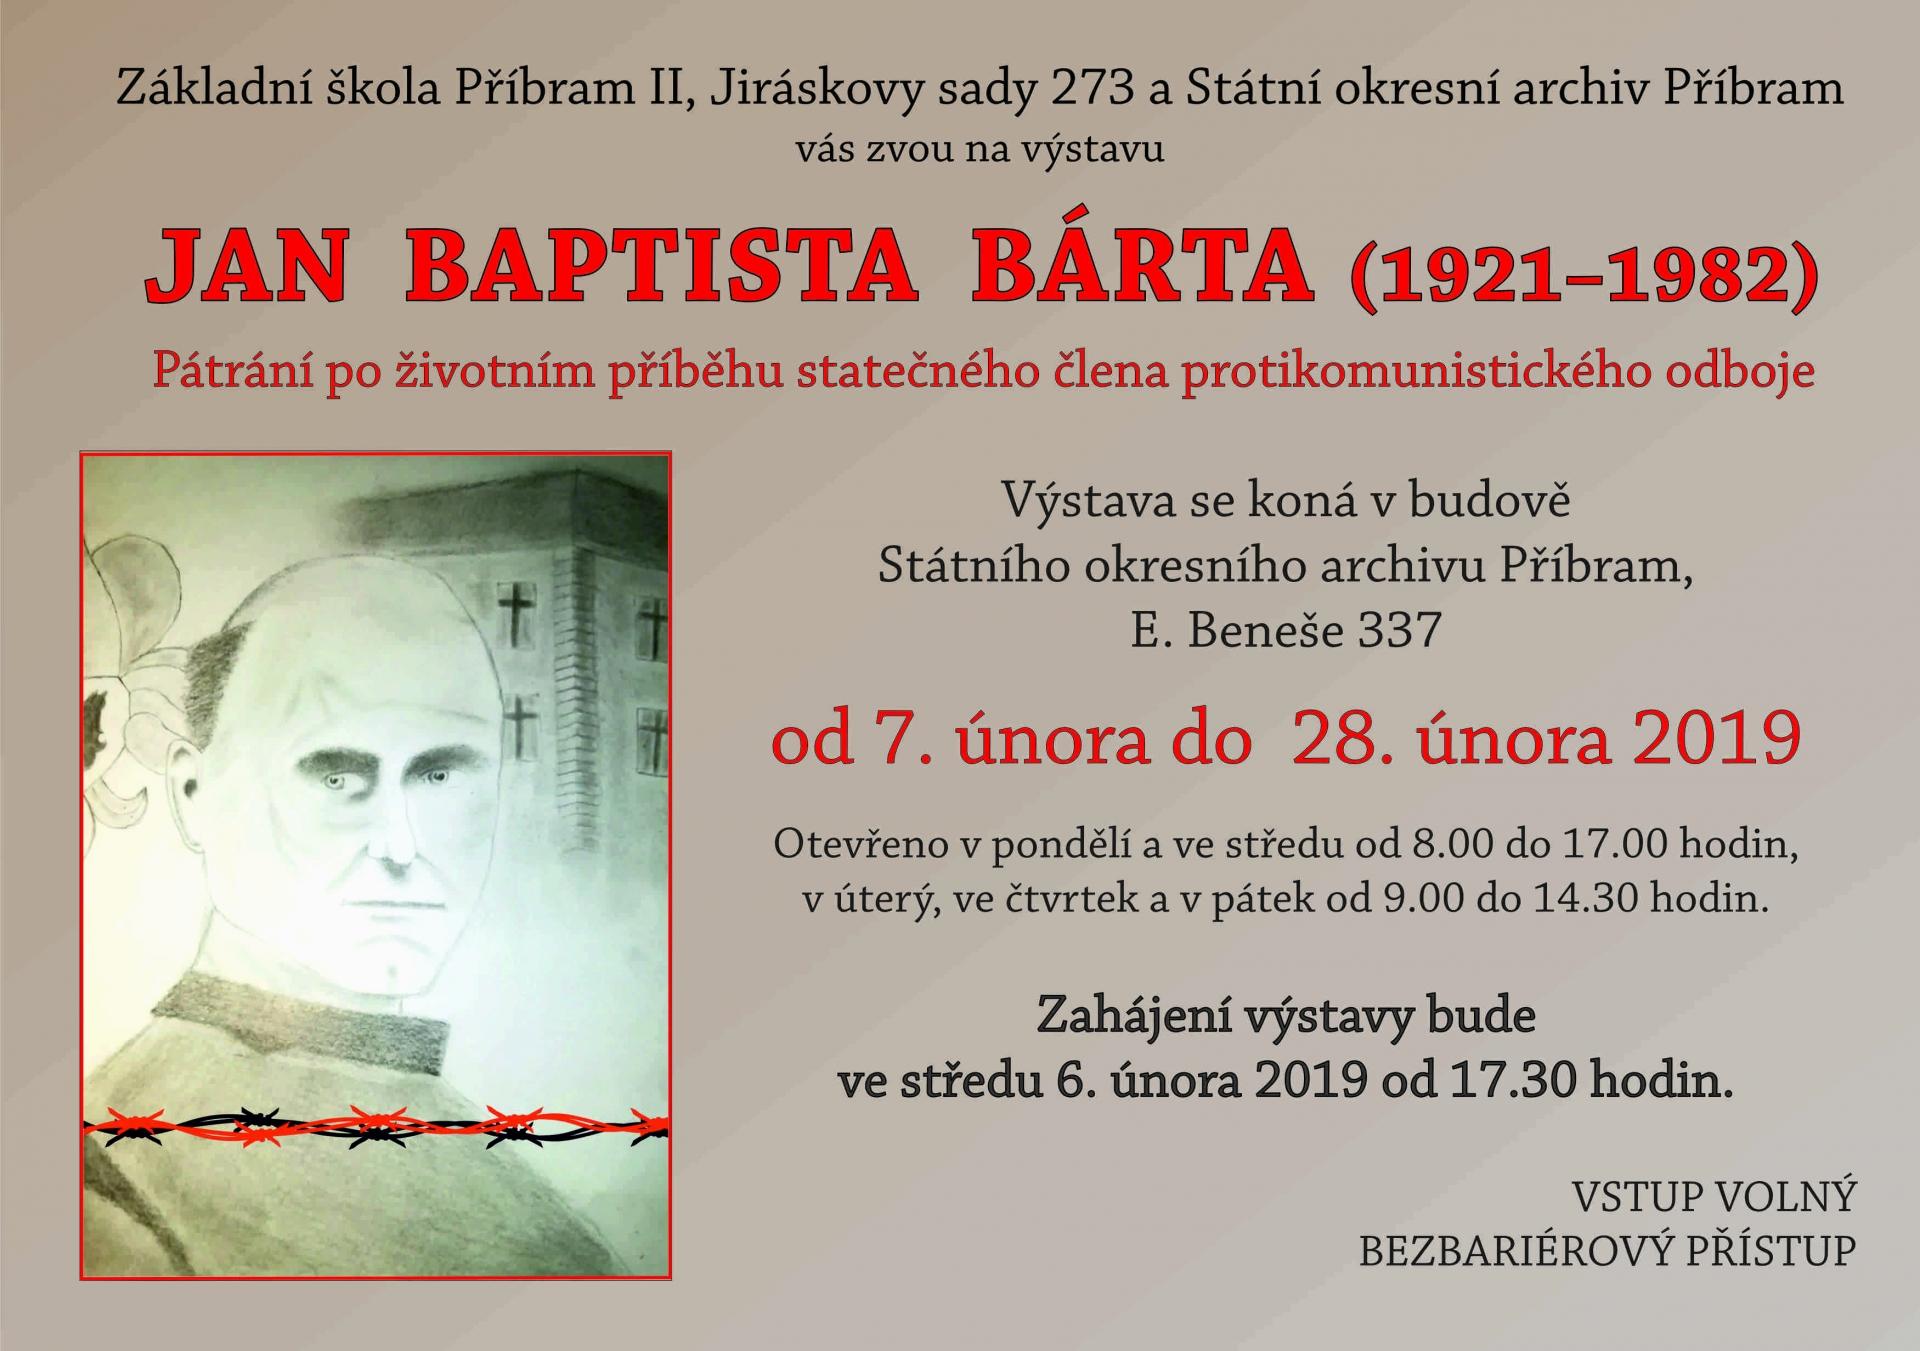 Jan Baptista Bárta